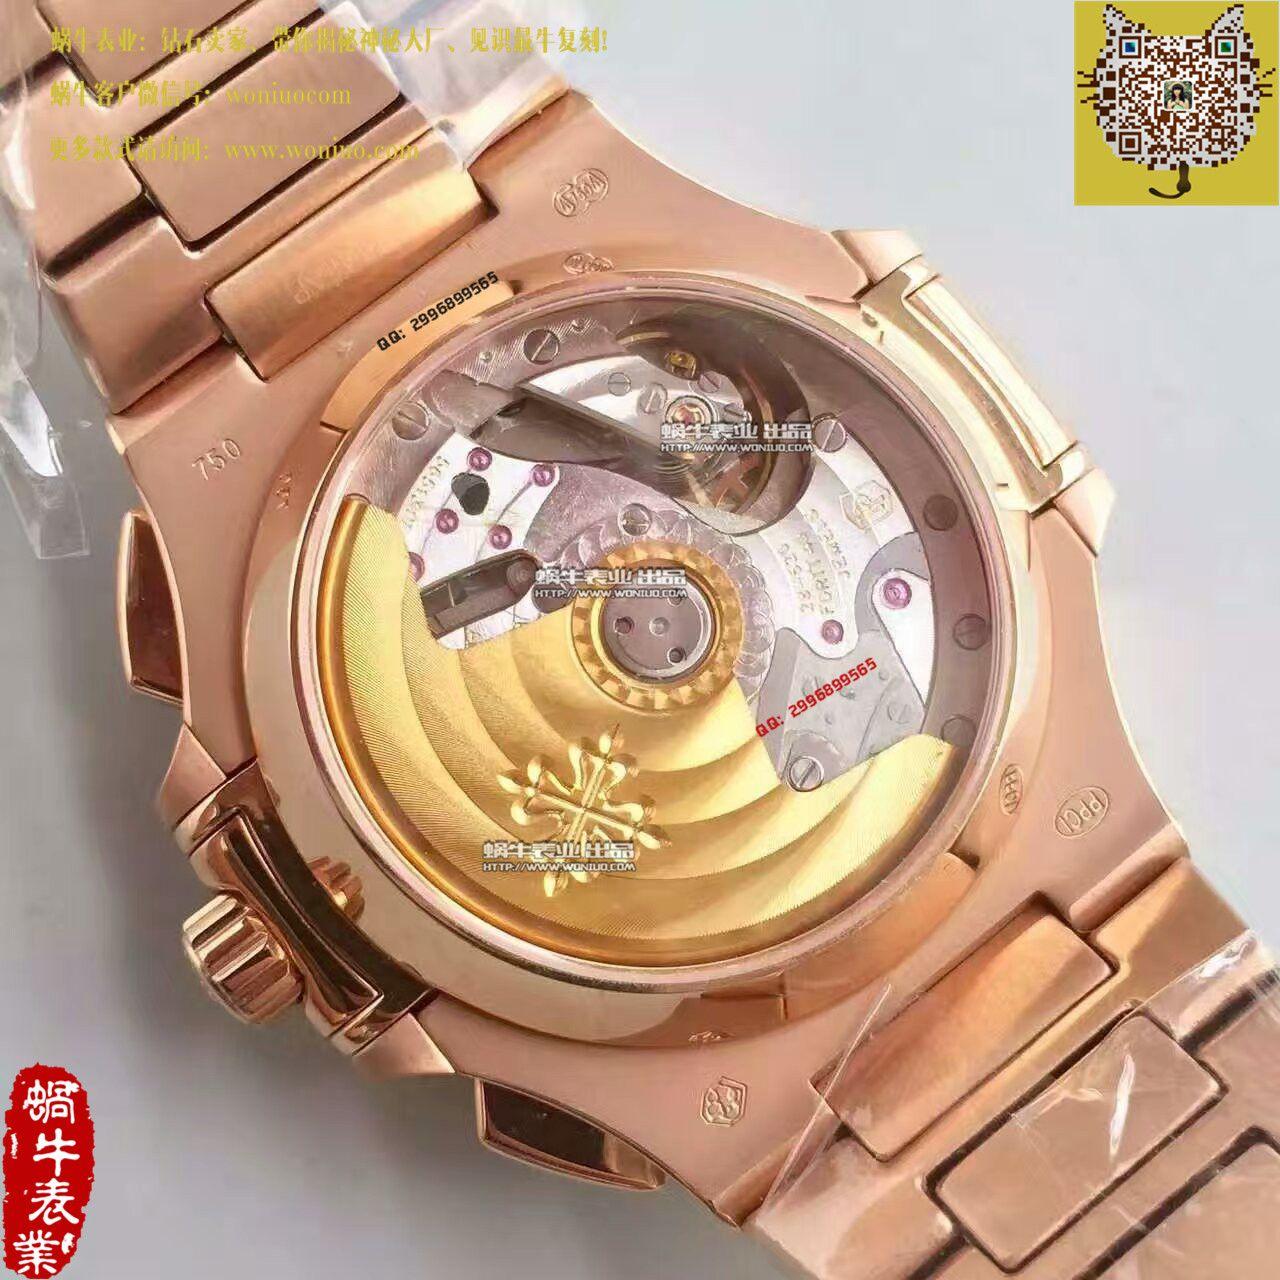 【BP厂1:1高仿手表】百达翡丽运动系列5980/1R-001腕表 / BD184